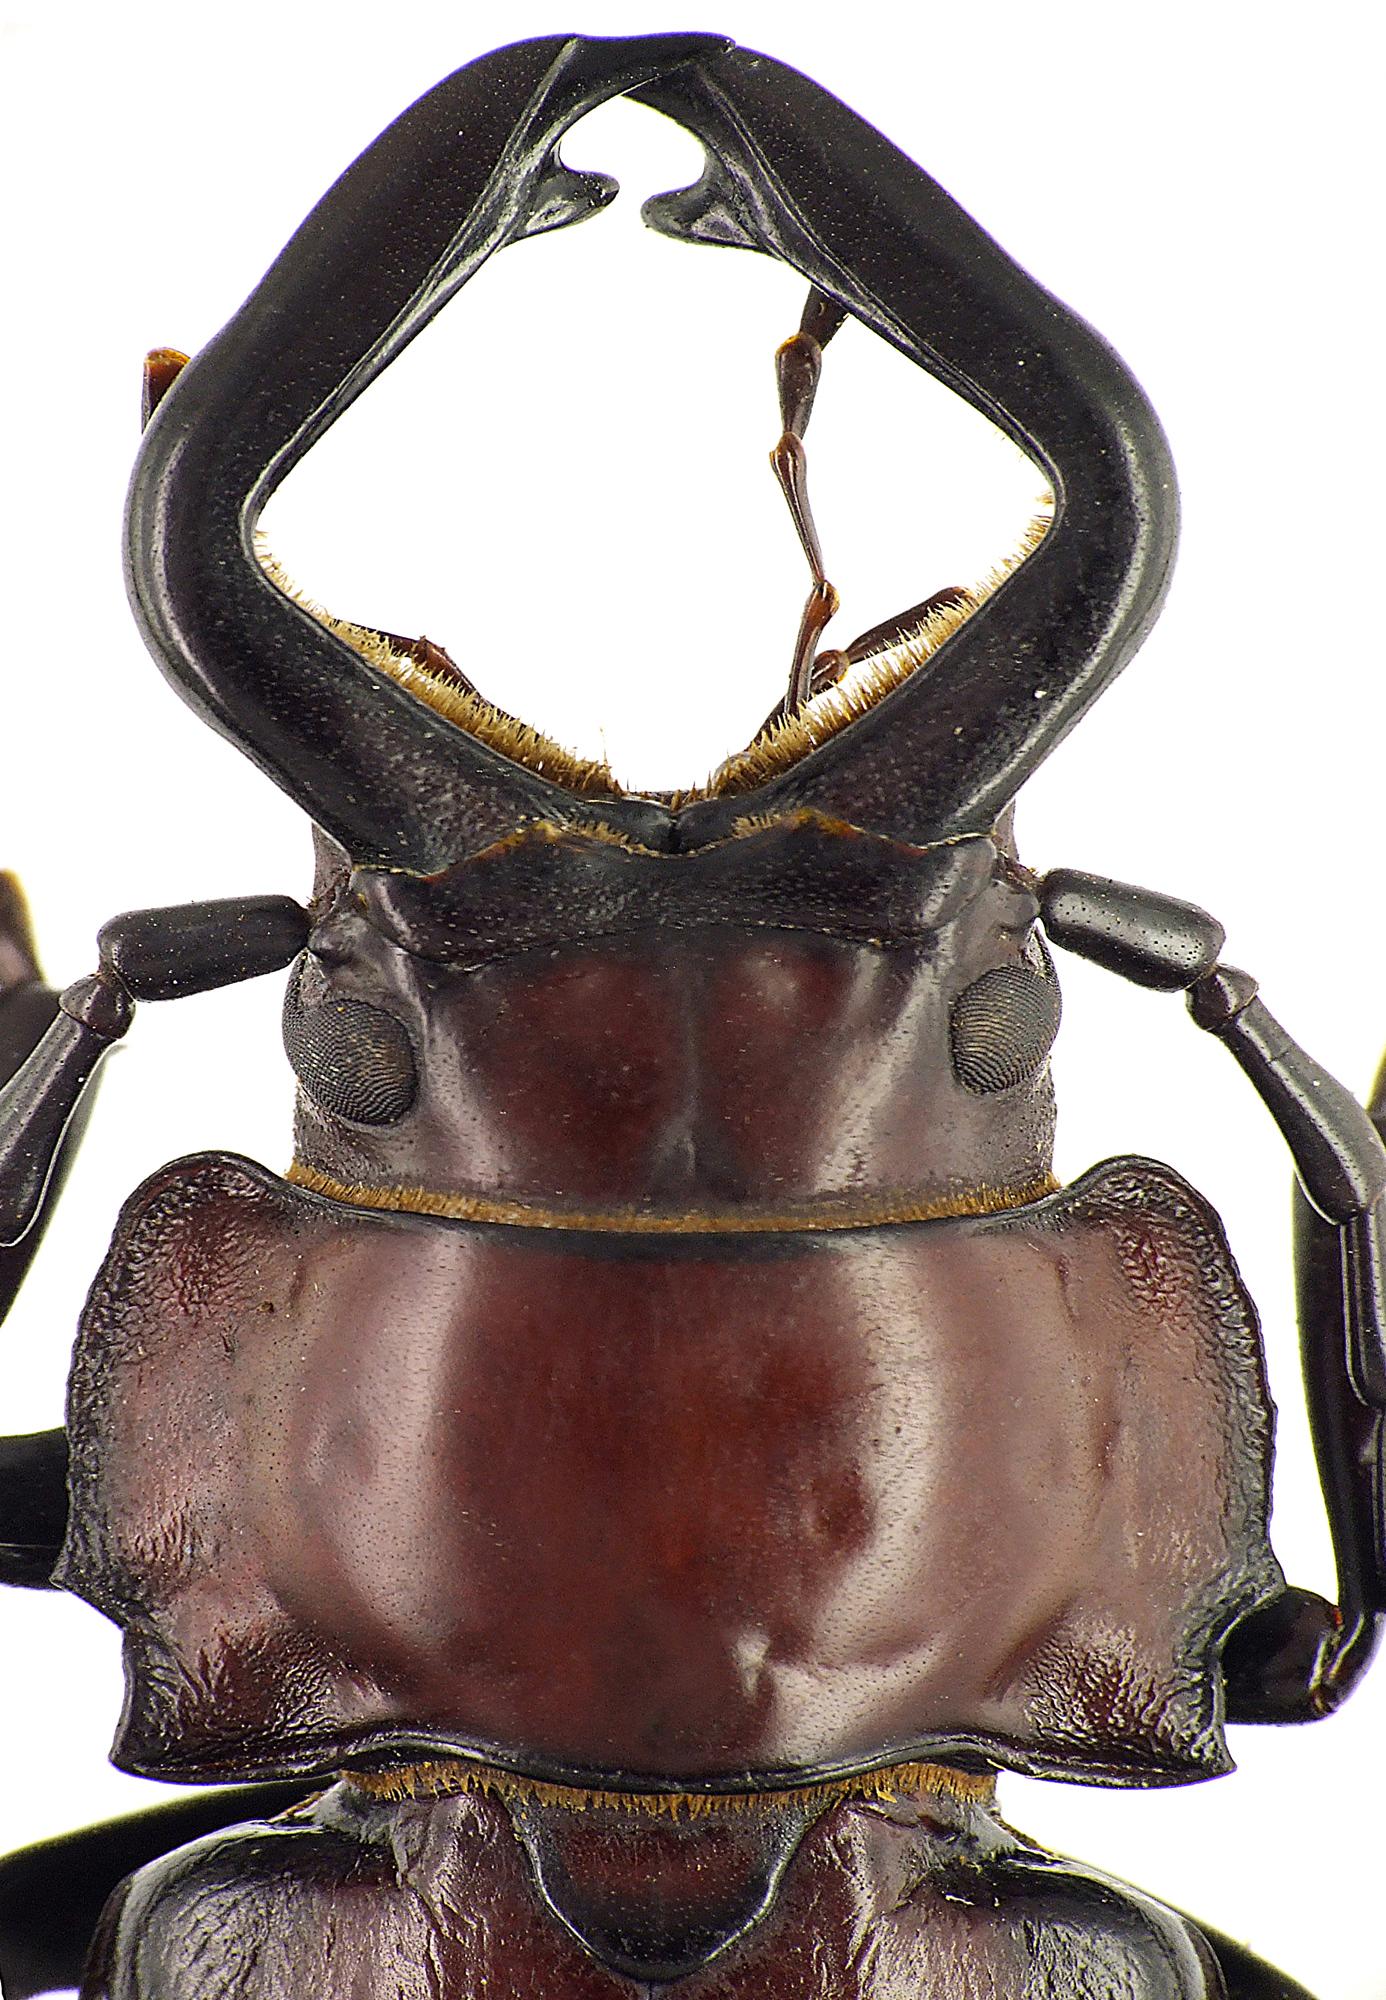 Notophysis forcipata 47289CZ92.jpg